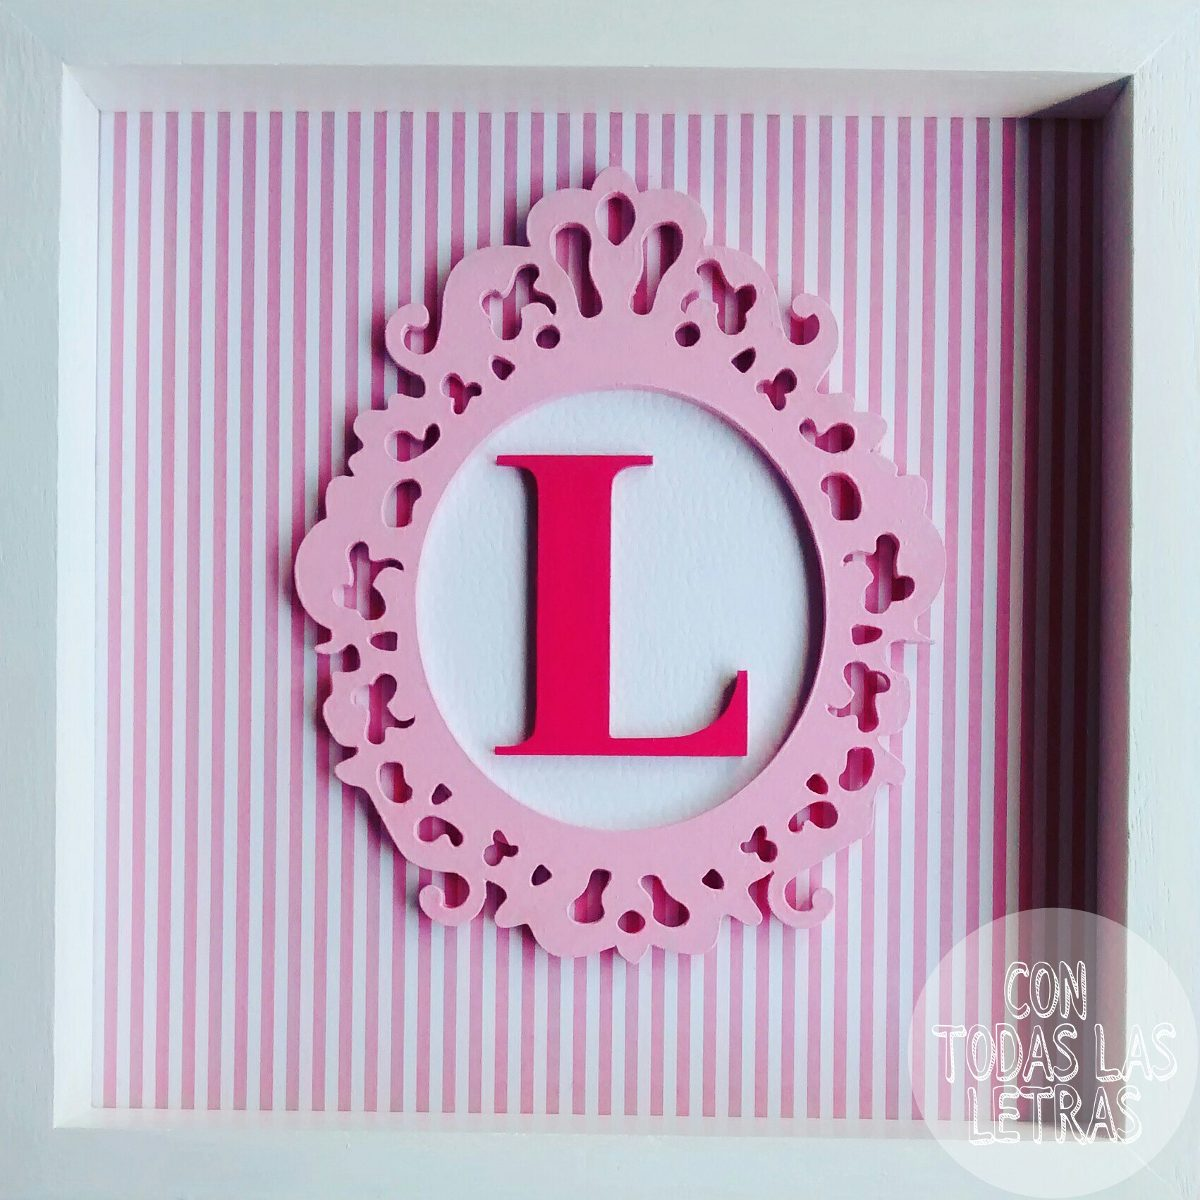 Cuadro Deco Letra Inicial 20x20cm, Shabby Chic.marco Box - $ 400,00 ...